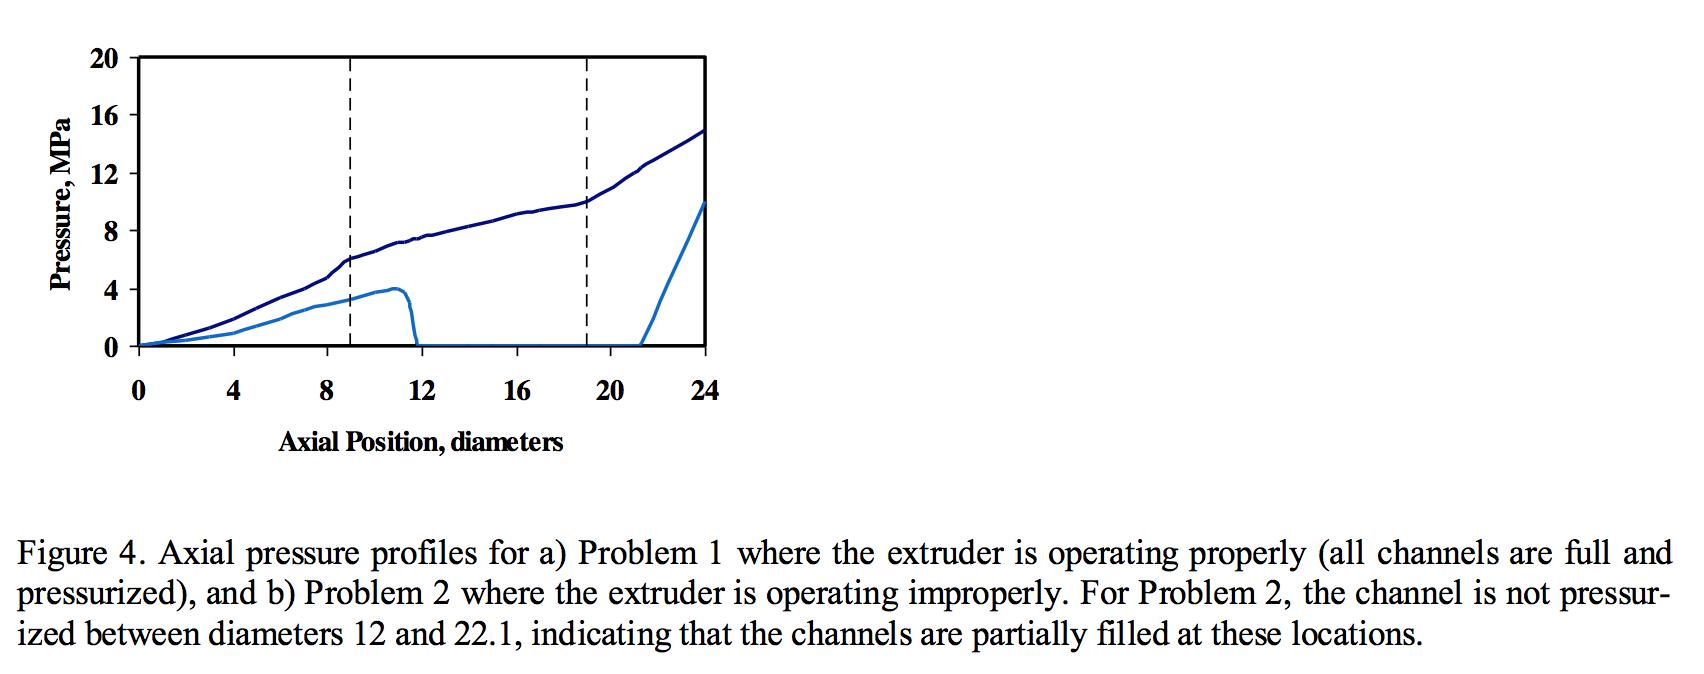 Axial pressure profiles